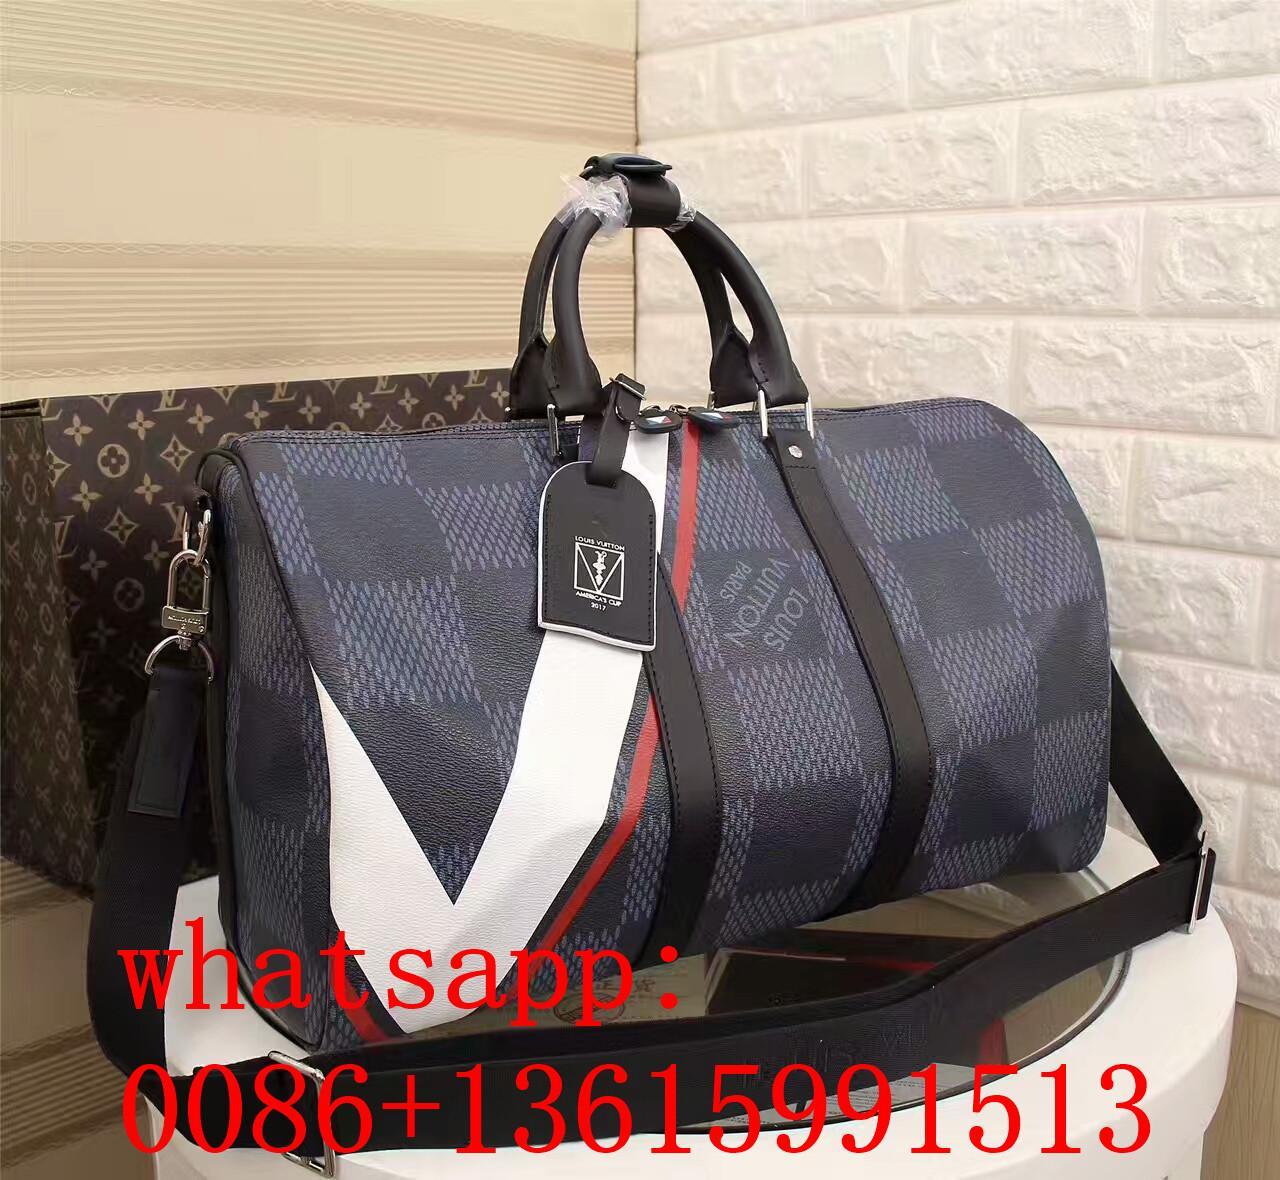 LV travelling bag